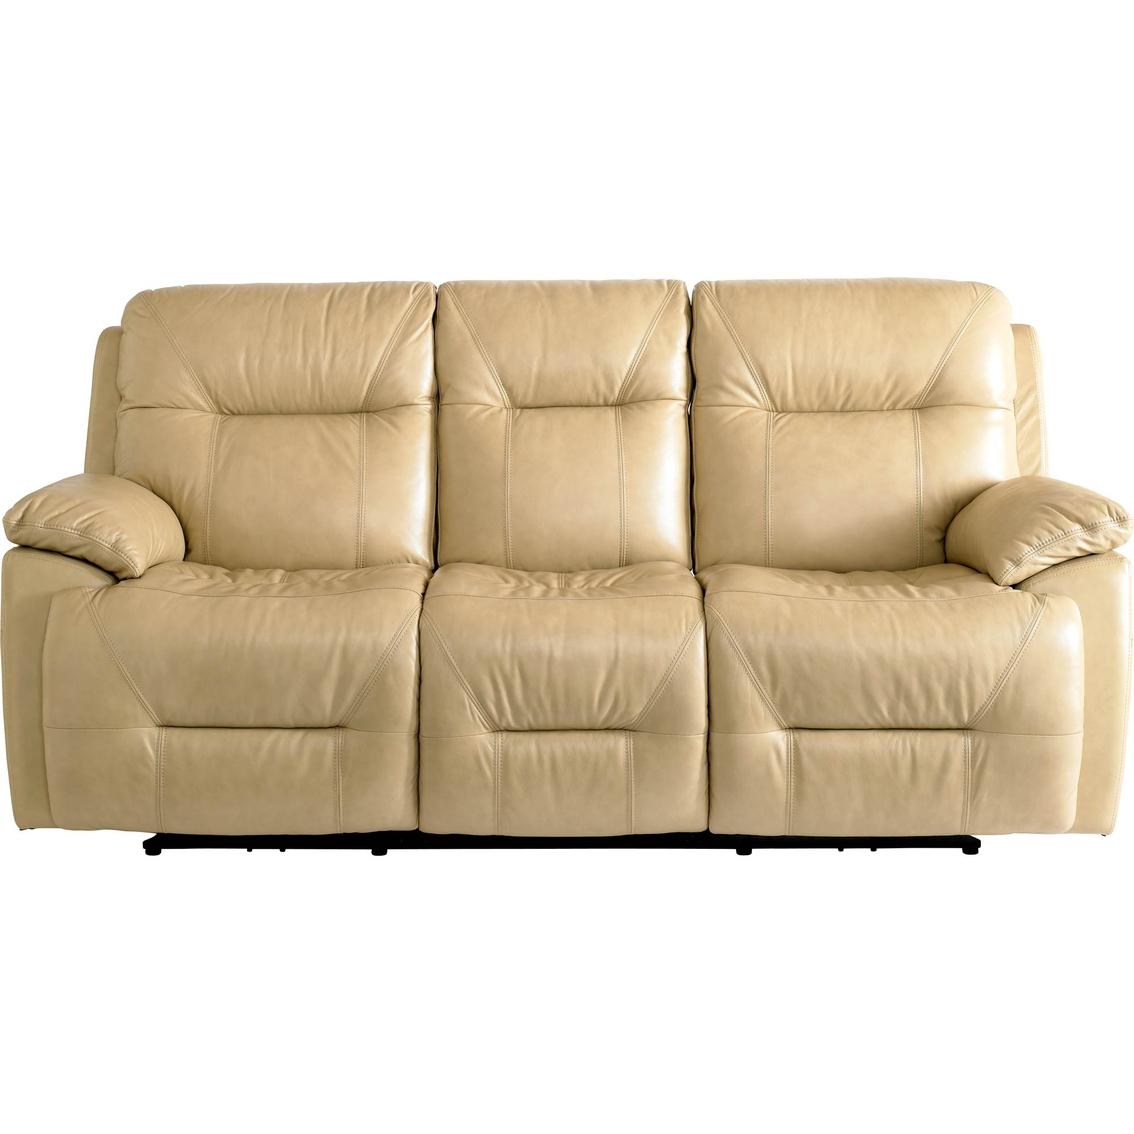 bassett reclining sectional sofa bassett hamilton power reclining sofa item number 3958p62ms. Black Bedroom Furniture Sets. Home Design Ideas